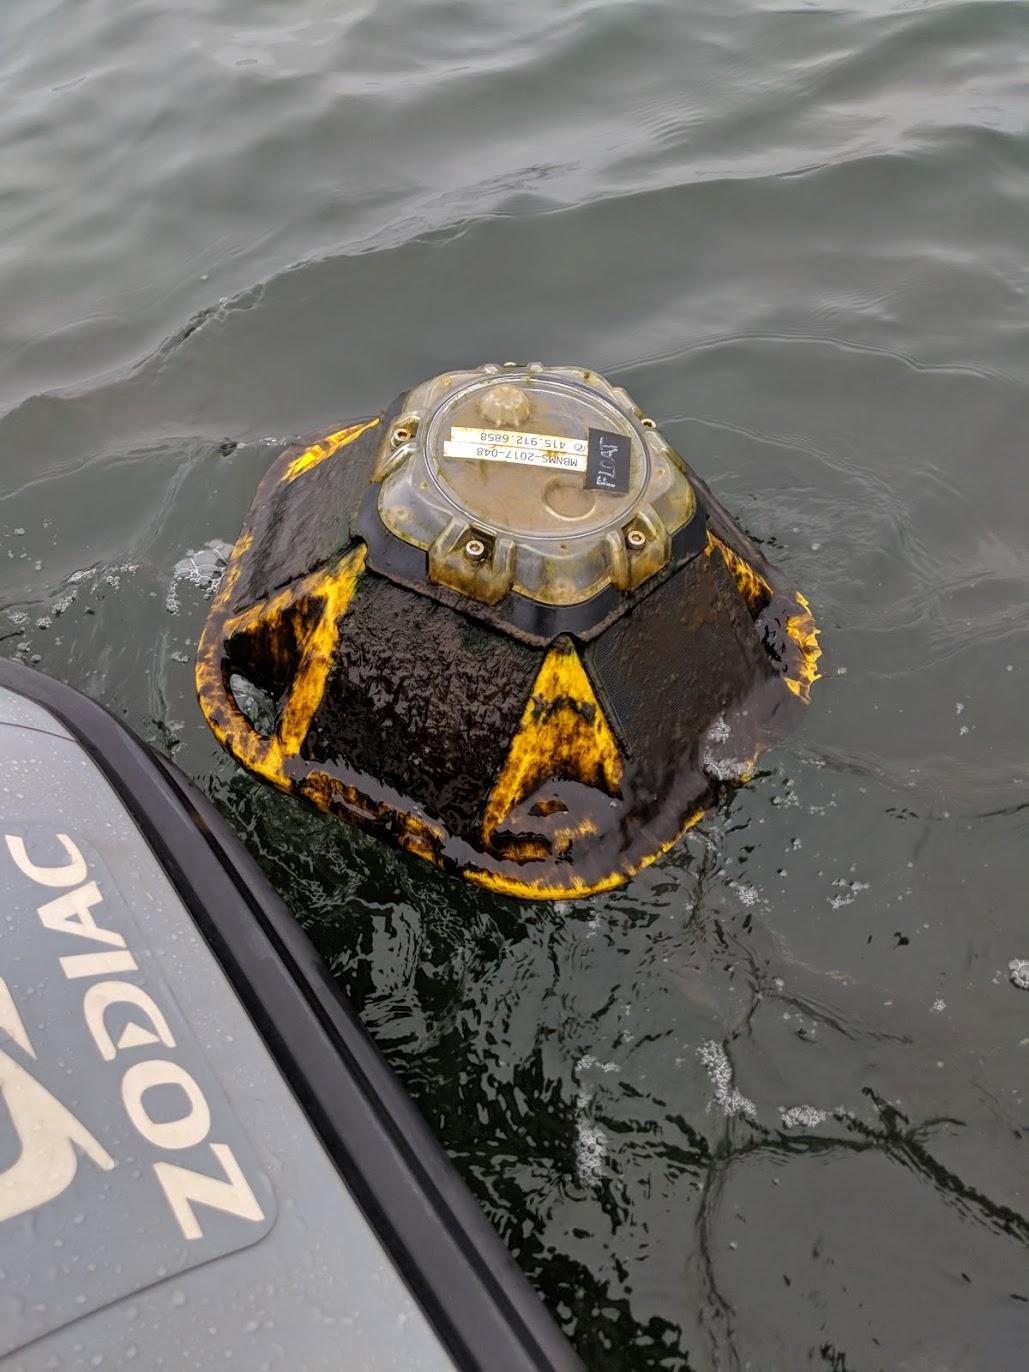 Dirty spotter buoy.